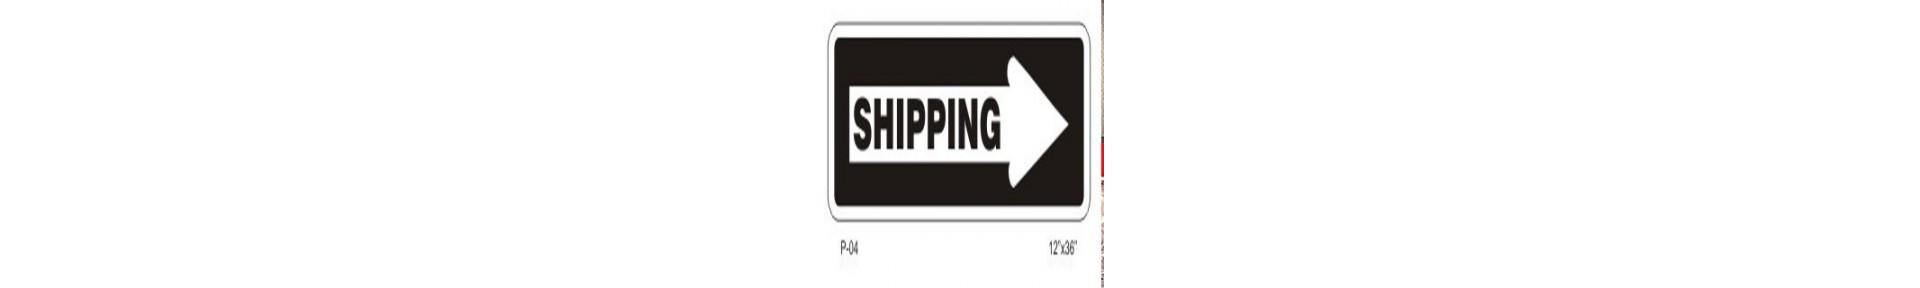 Trucks, Shipping &amp, Receiving Signs &mdash